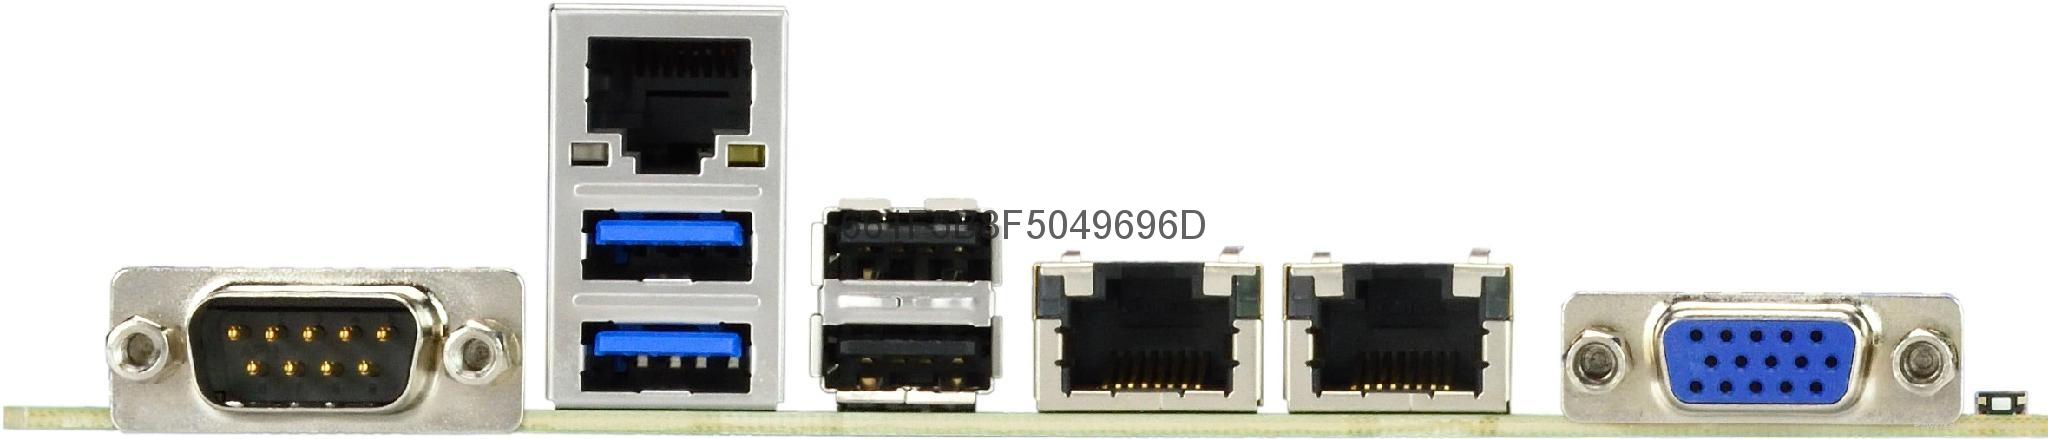 Supermicro超微 X11DPI-N 雙路服務器主板 LGA 3647E-ATX主板 3